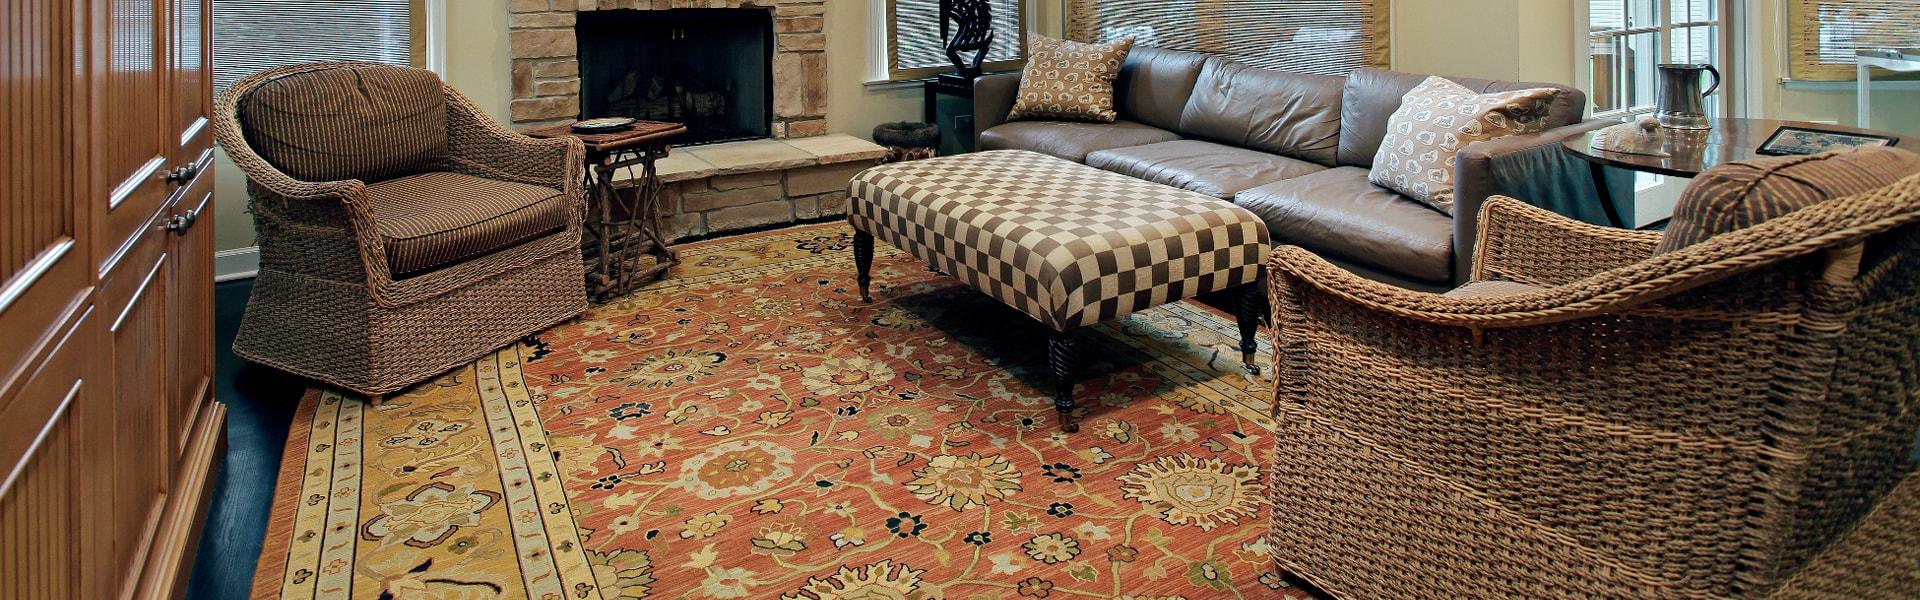 Oriental Rug Cleaning | Simply Clean